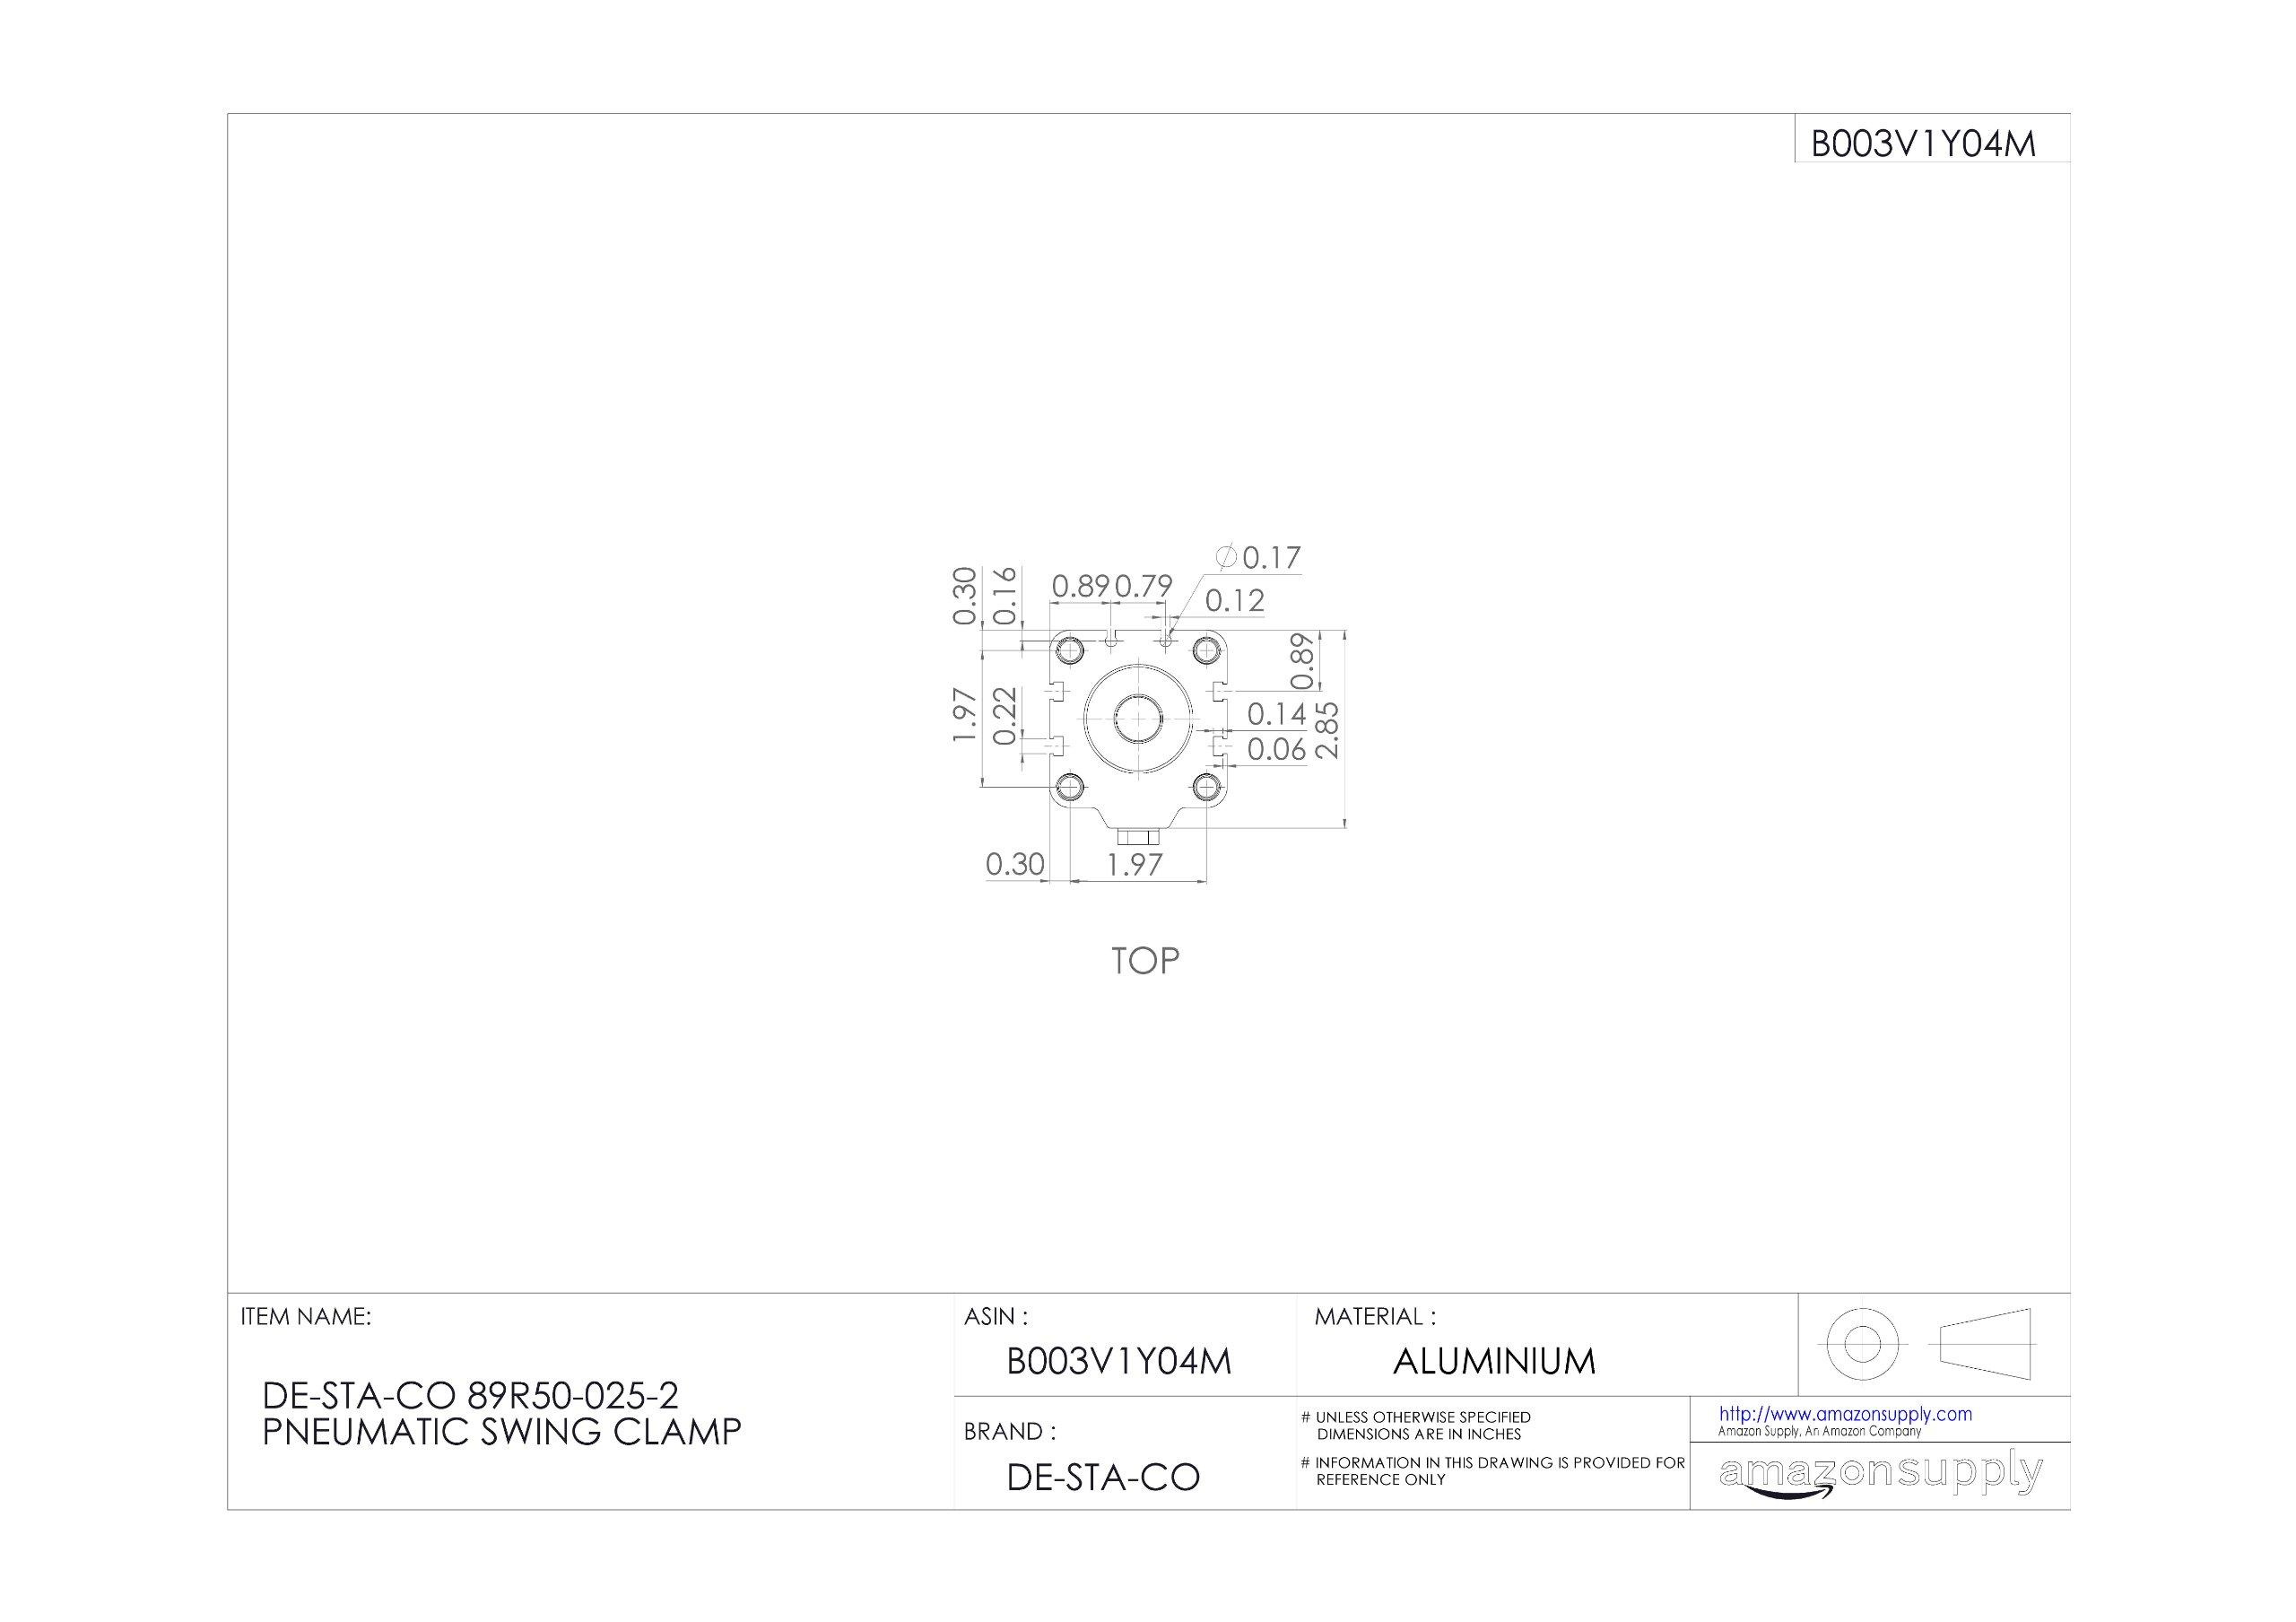 DE-STA-CO 89R50-025-2 Pneumatic Swing Clamp by De-Sta-Co (Image #4)